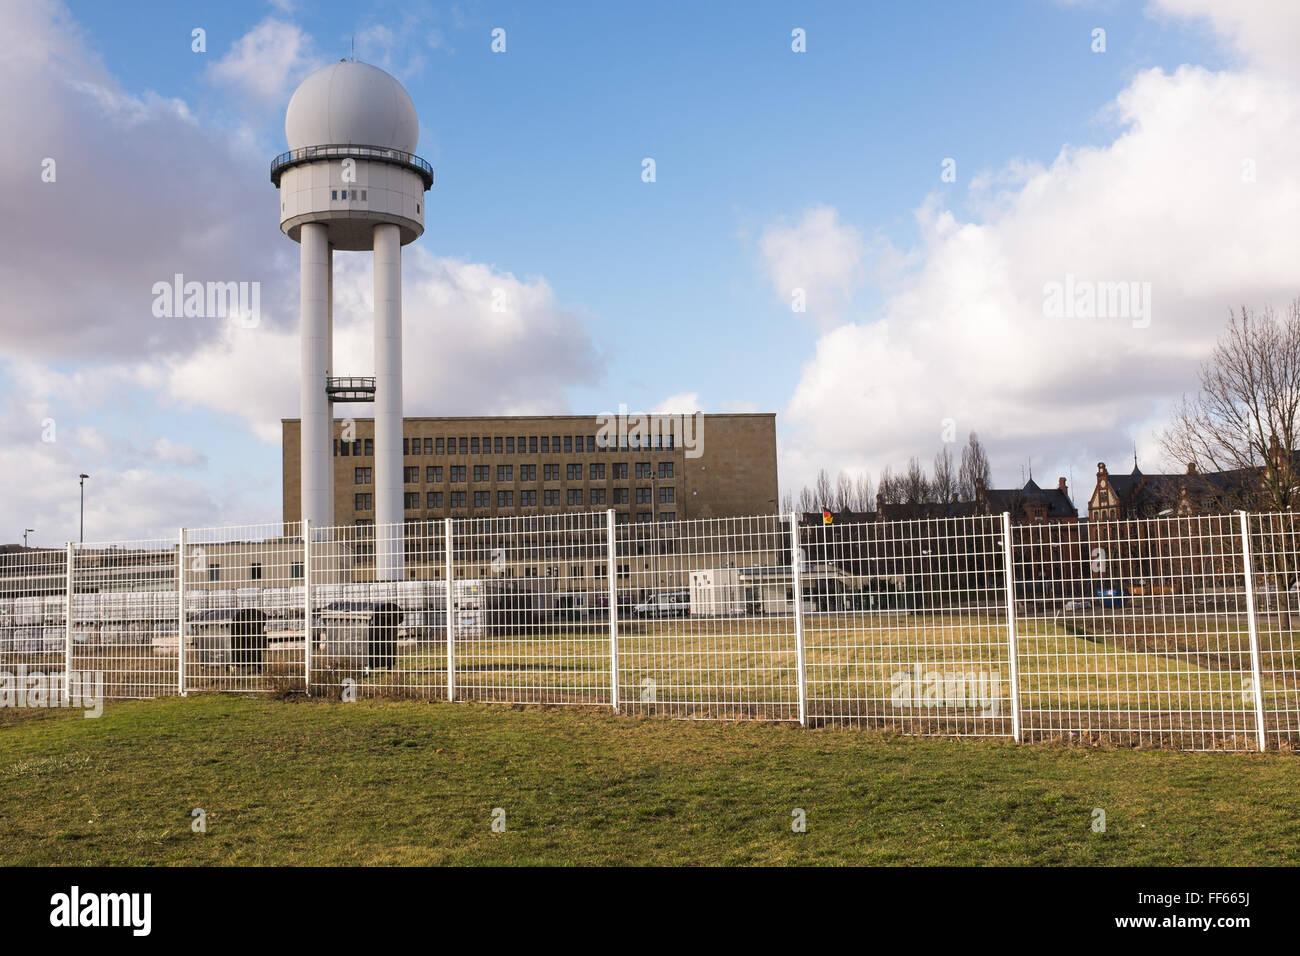 BERLIN, JANUARY 28: The 'Flughafen Berlin-Tempelhof' (german for 'Berlin Tempelhof Airport' on January - Stock Image